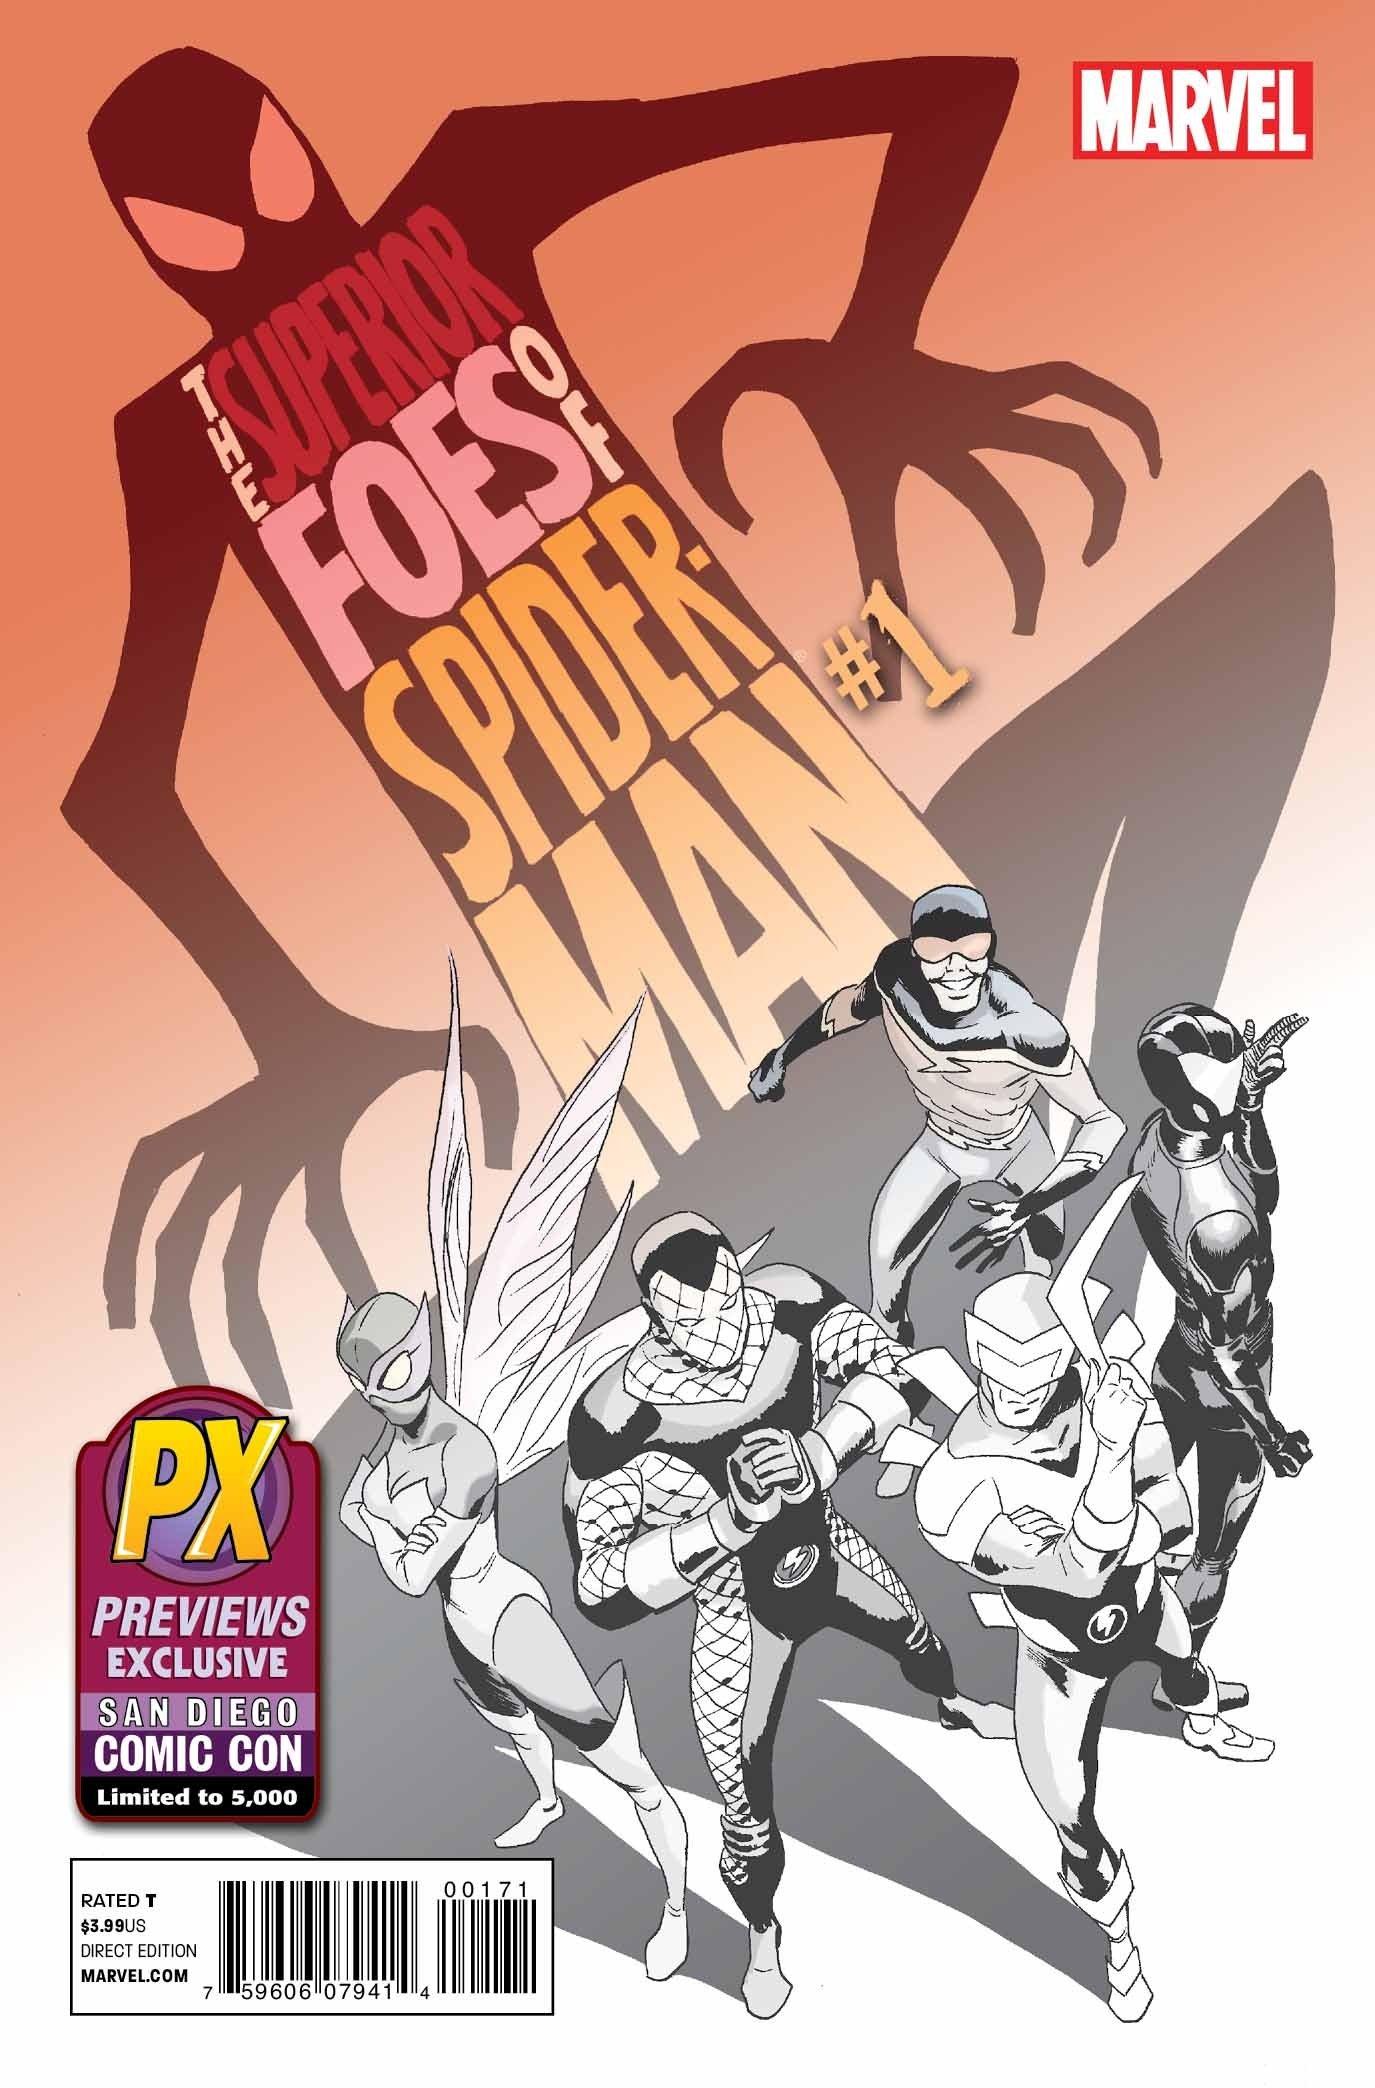 Marvel Comics SUPERIOR SPIDER-MAN #1 first printing Comic Fest